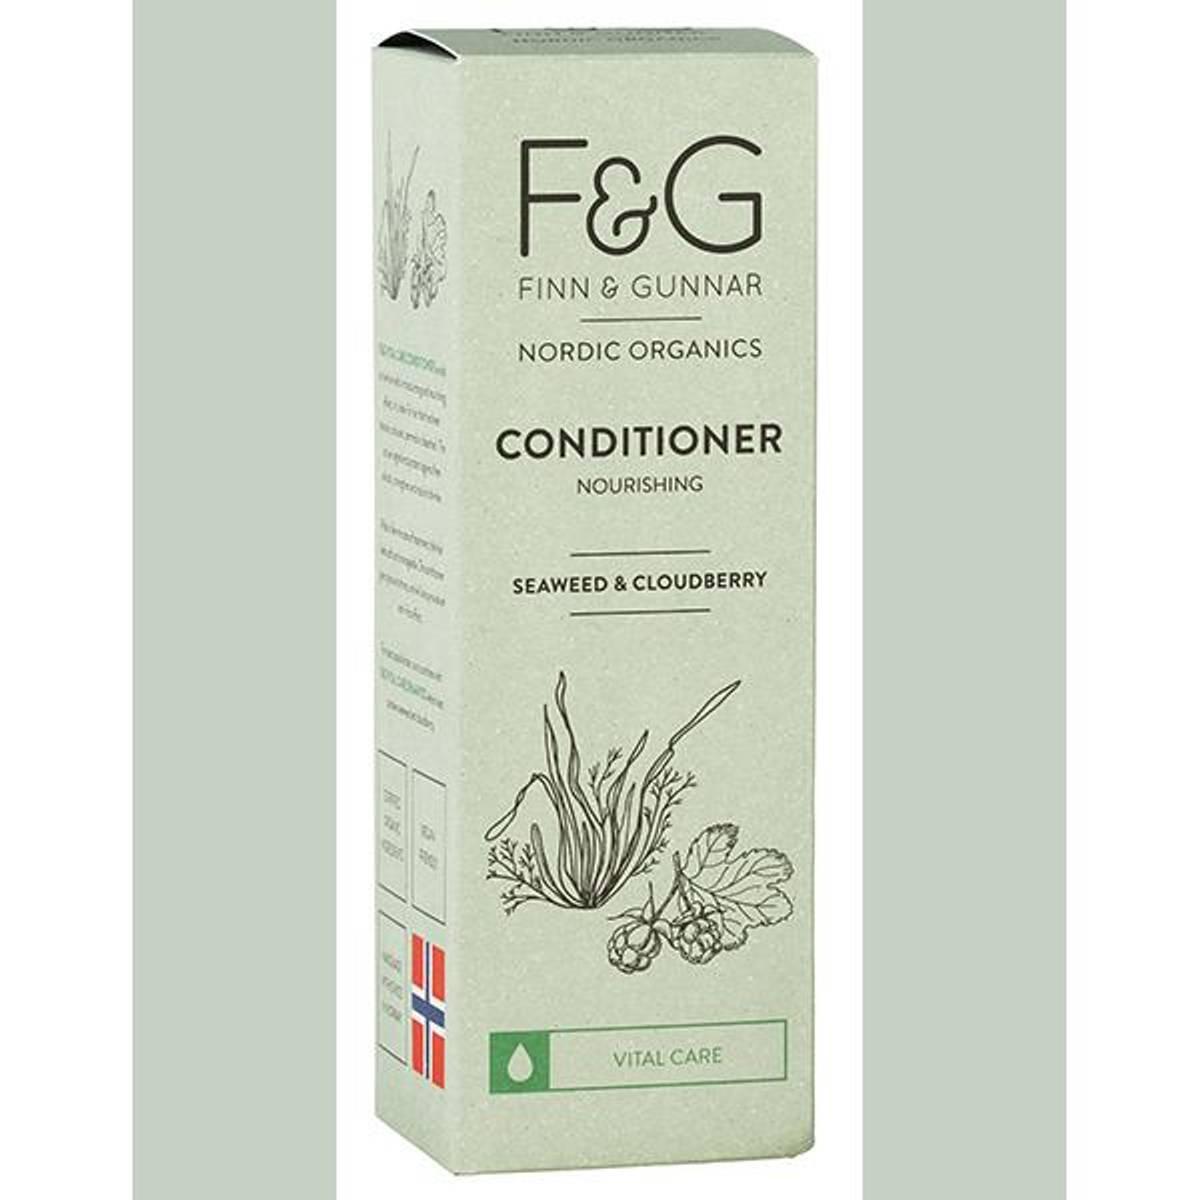 F&G Nordic Organics Conditioner Nourishing 200 ml